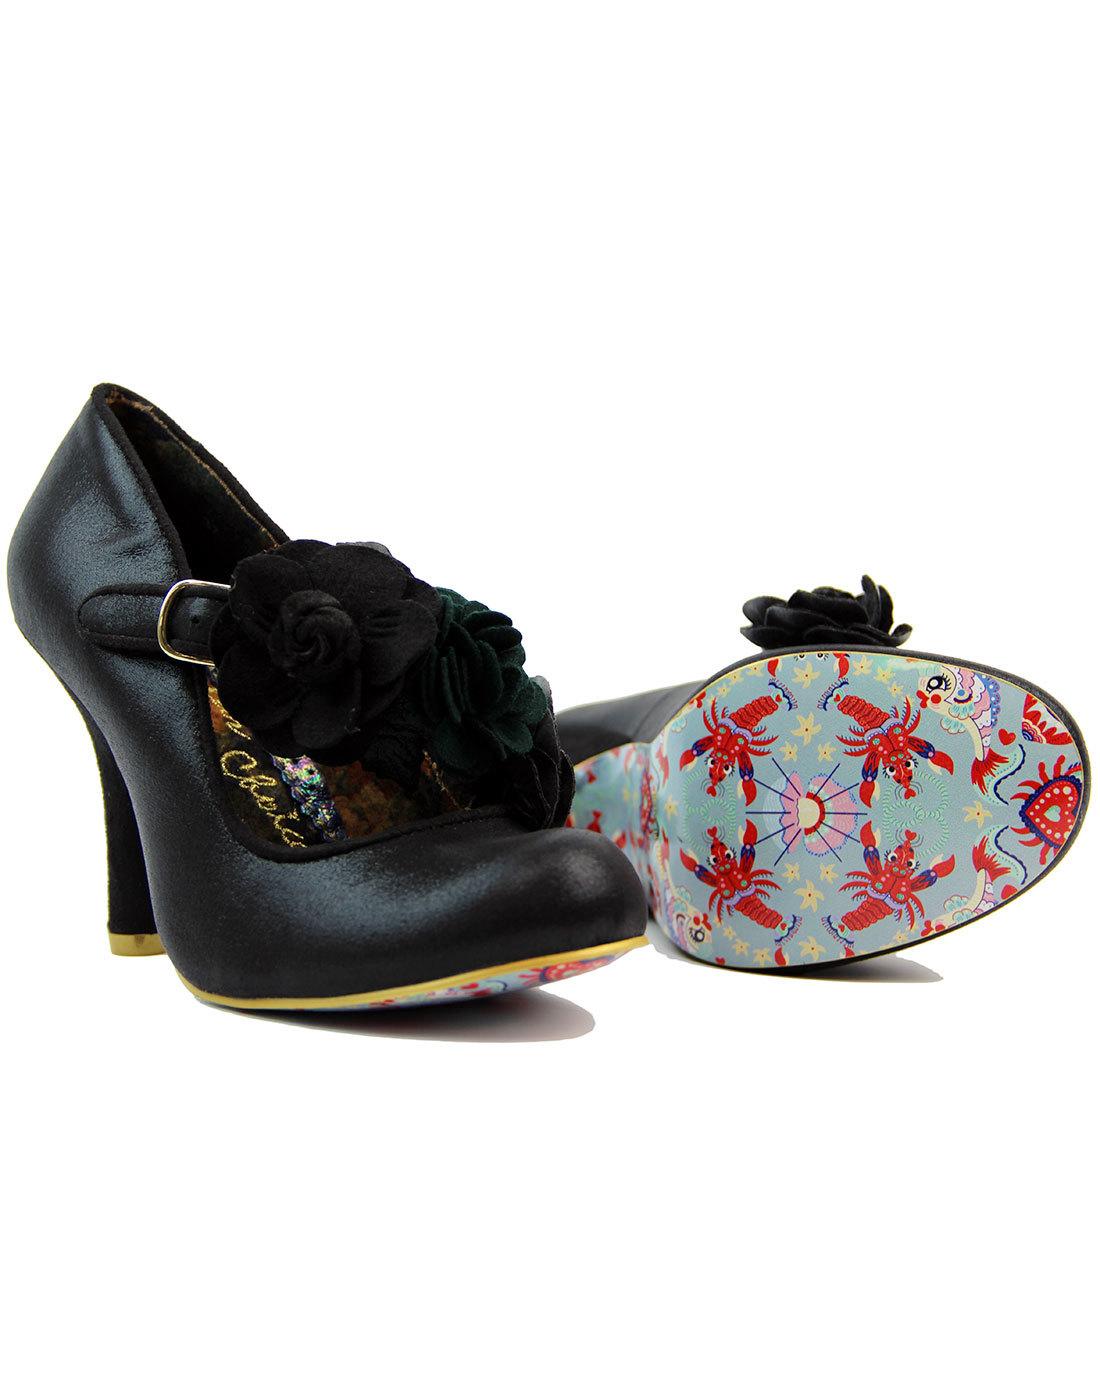 Irregular Choice Aurora High Heel Stiletto Shoes